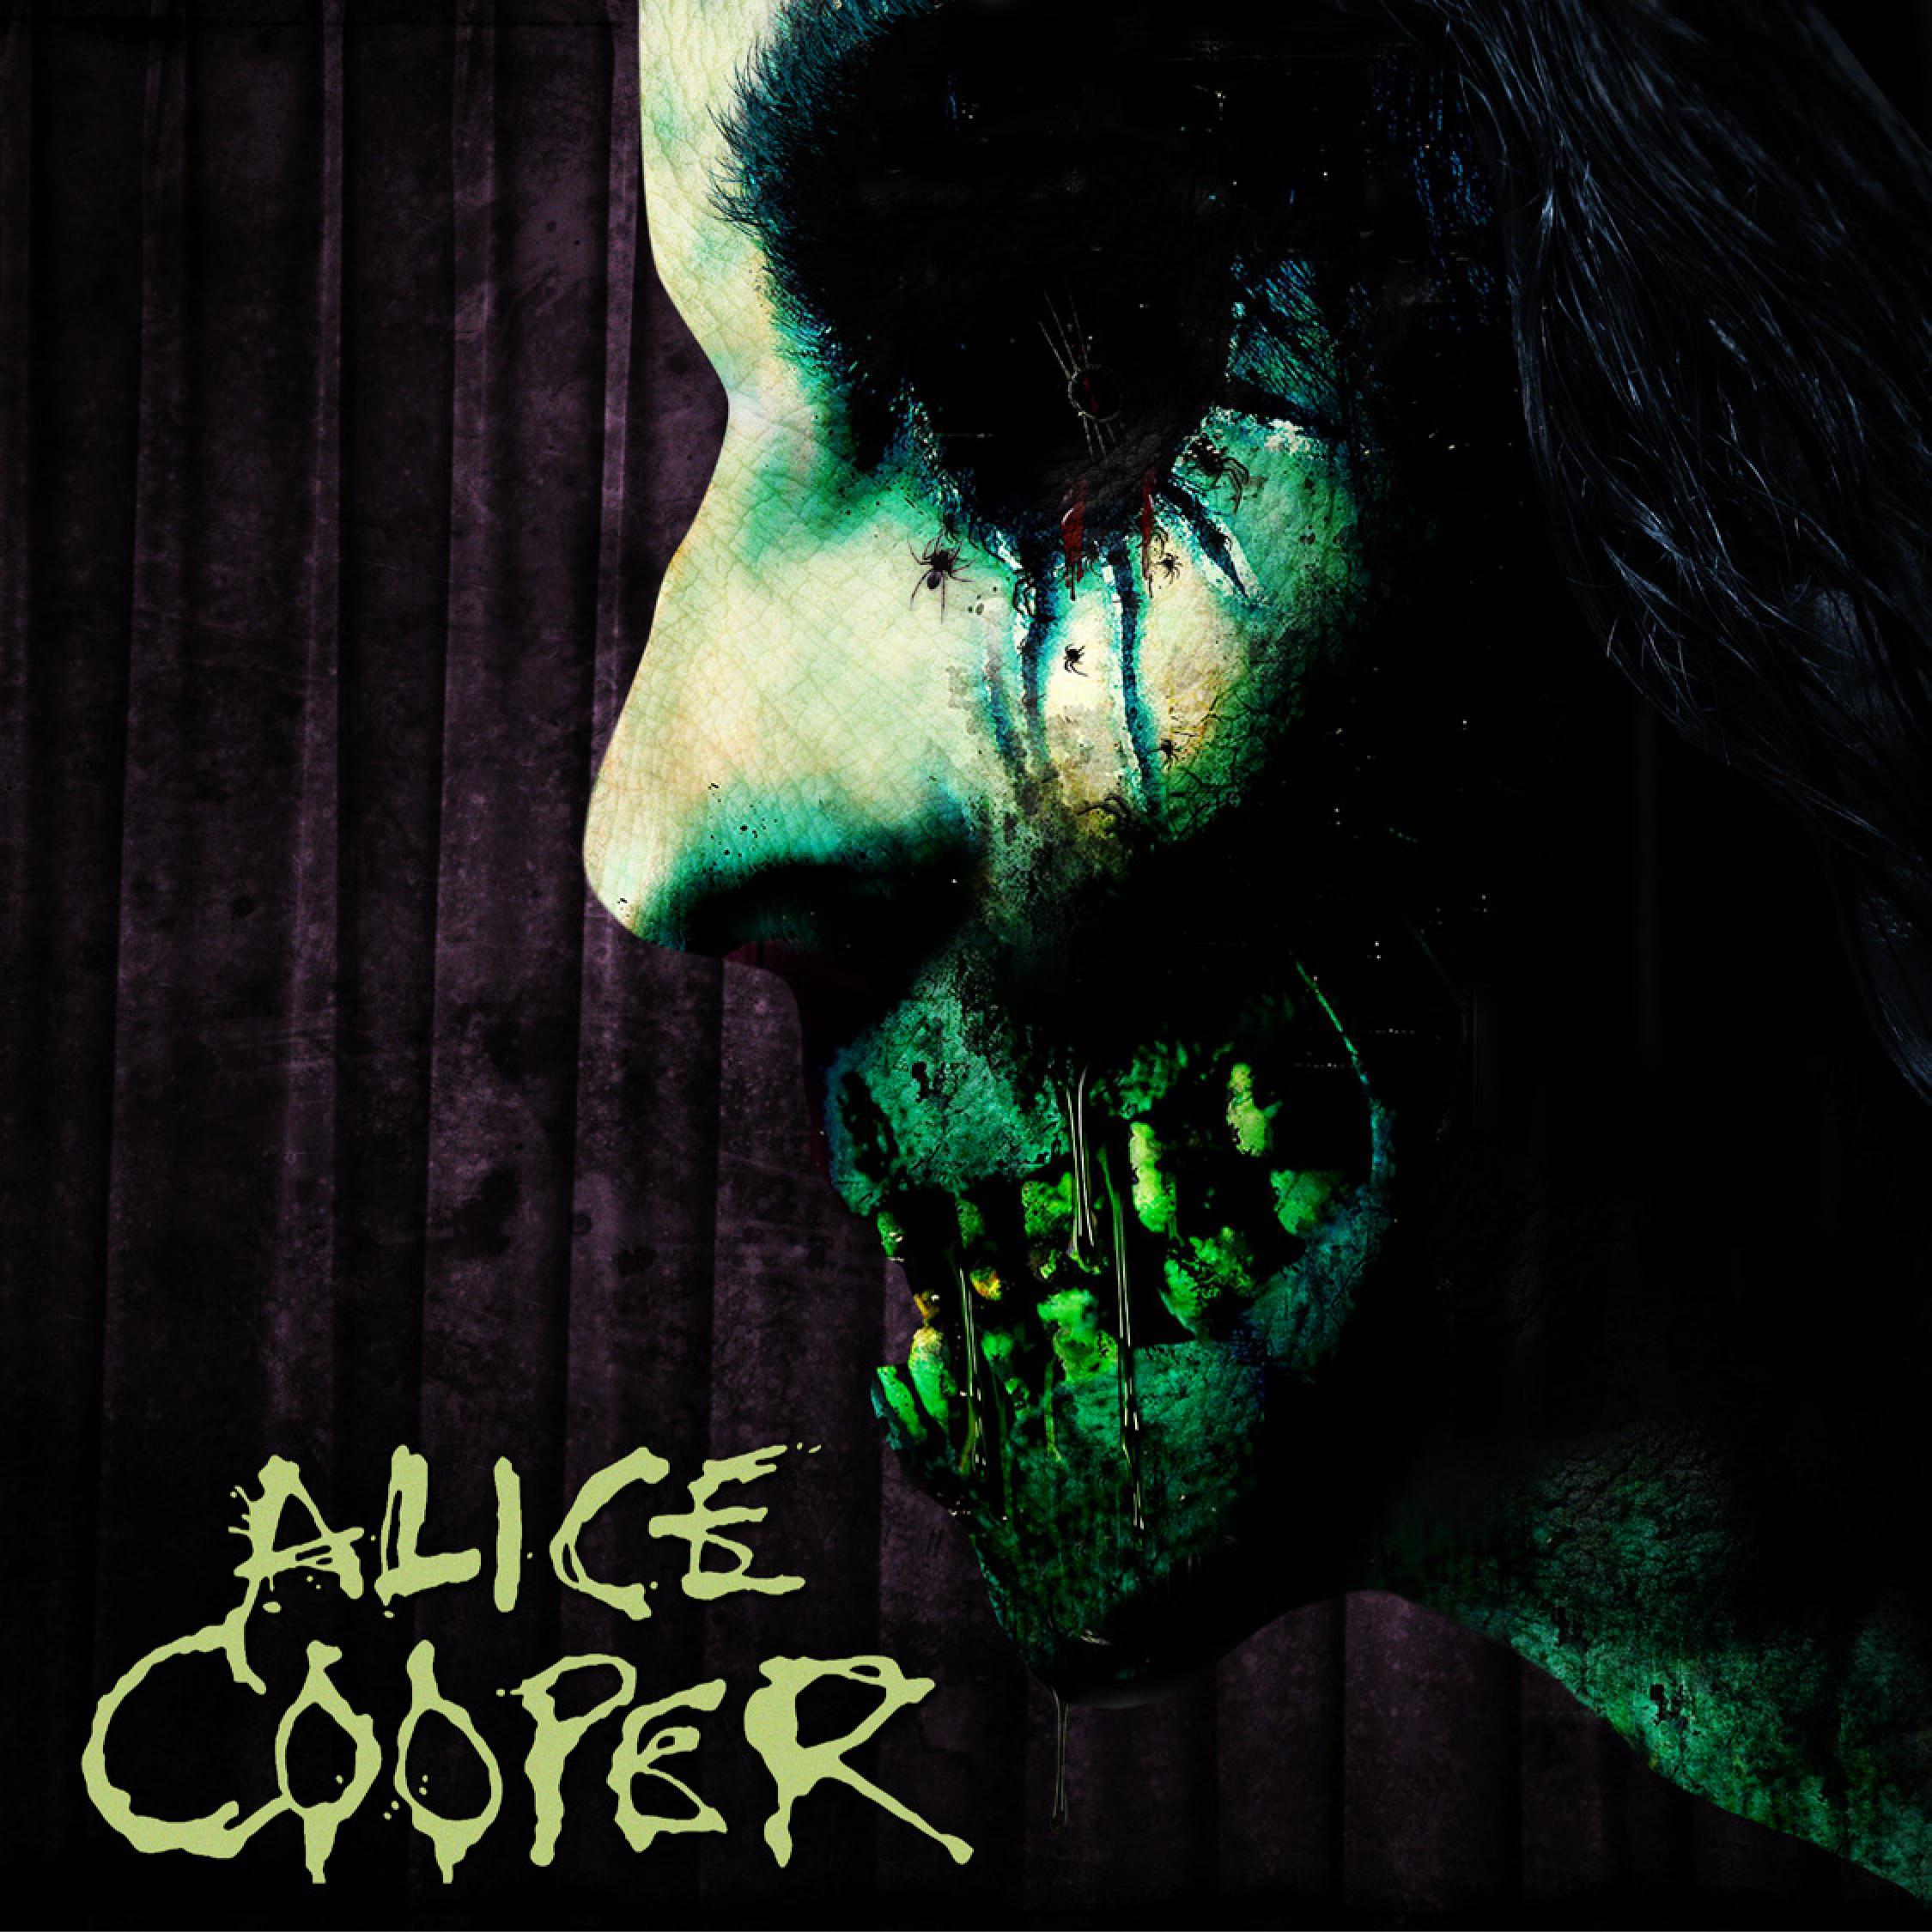 alice cooper to evoke maniacal mayhem at universal studios halloween horror nights bloody disgusting